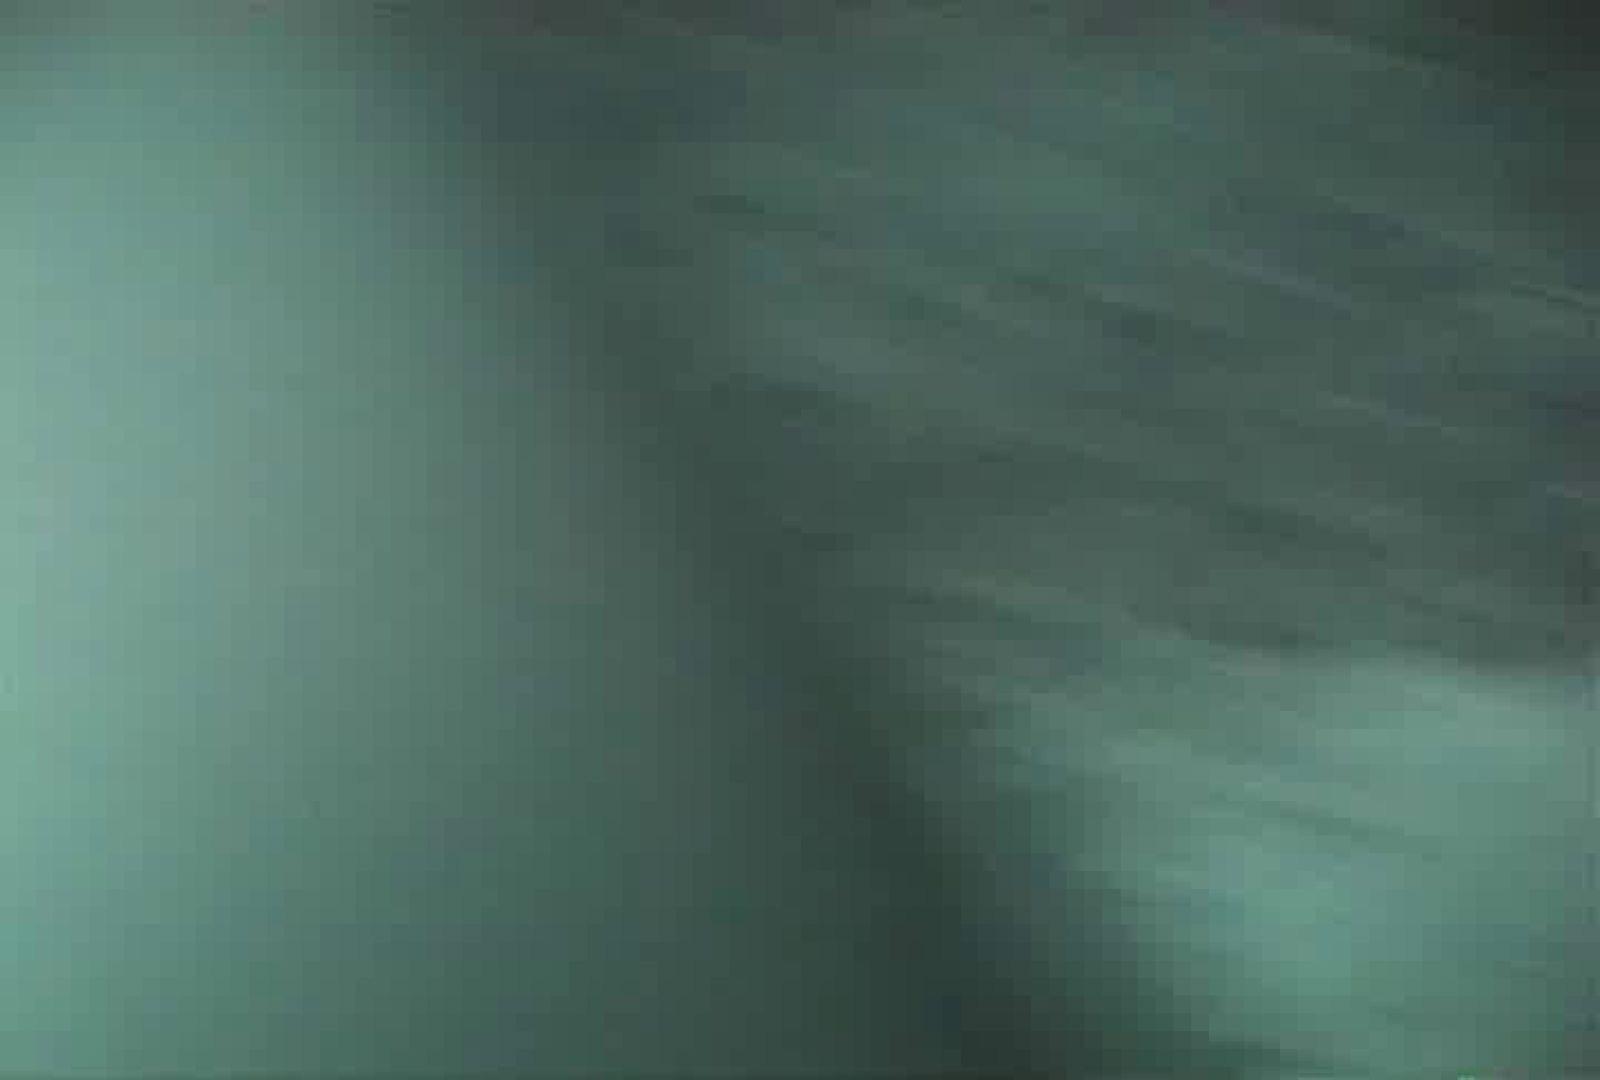 充血監督の深夜の運動会Vol.47 0  76連発 44